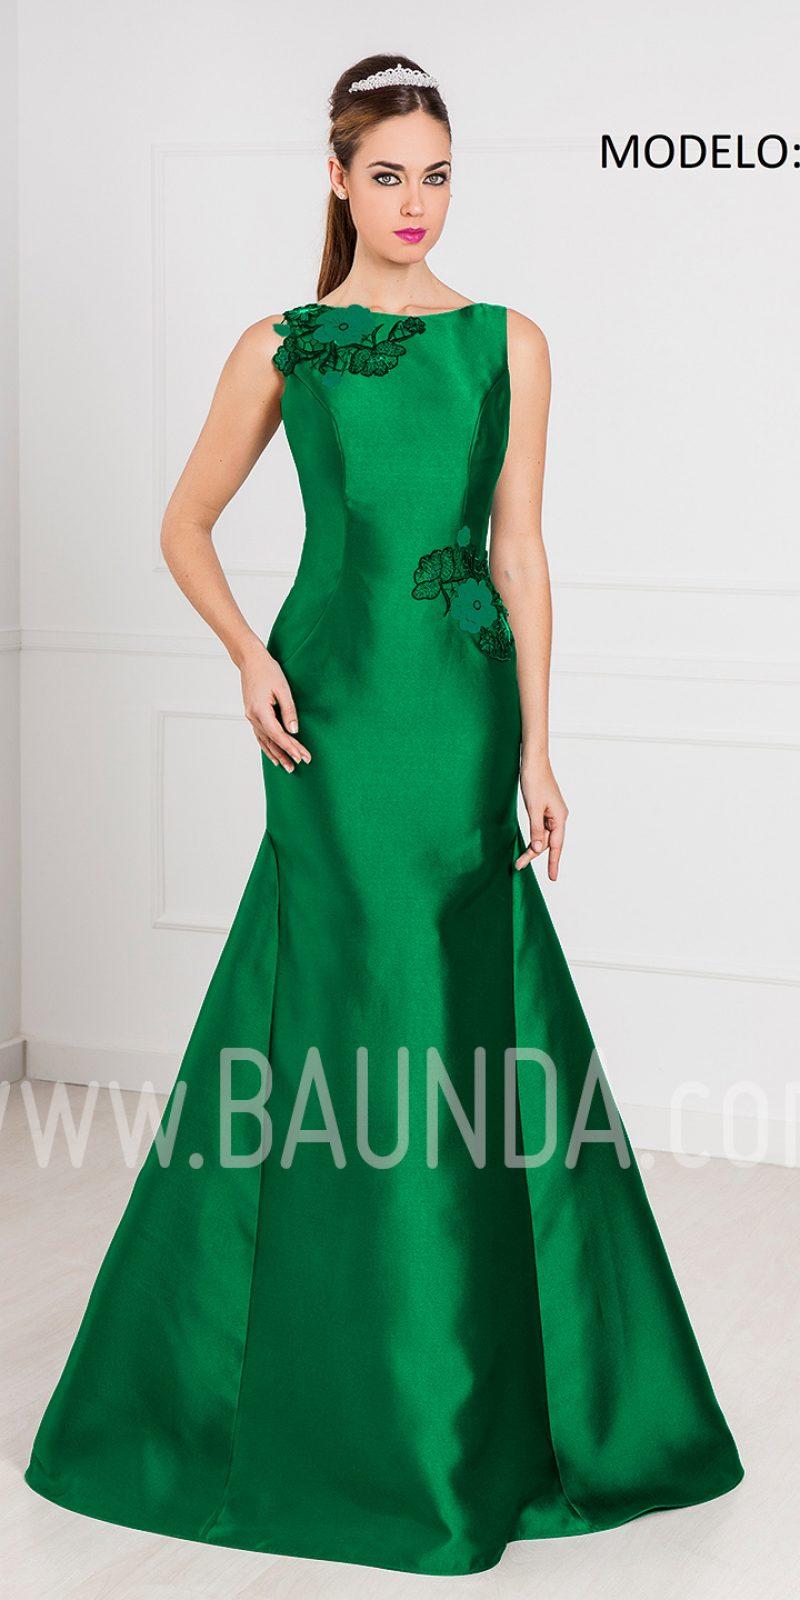 Baunda Vestido De Fiesta Largo Sirena Verde 2017 Rojo Xm